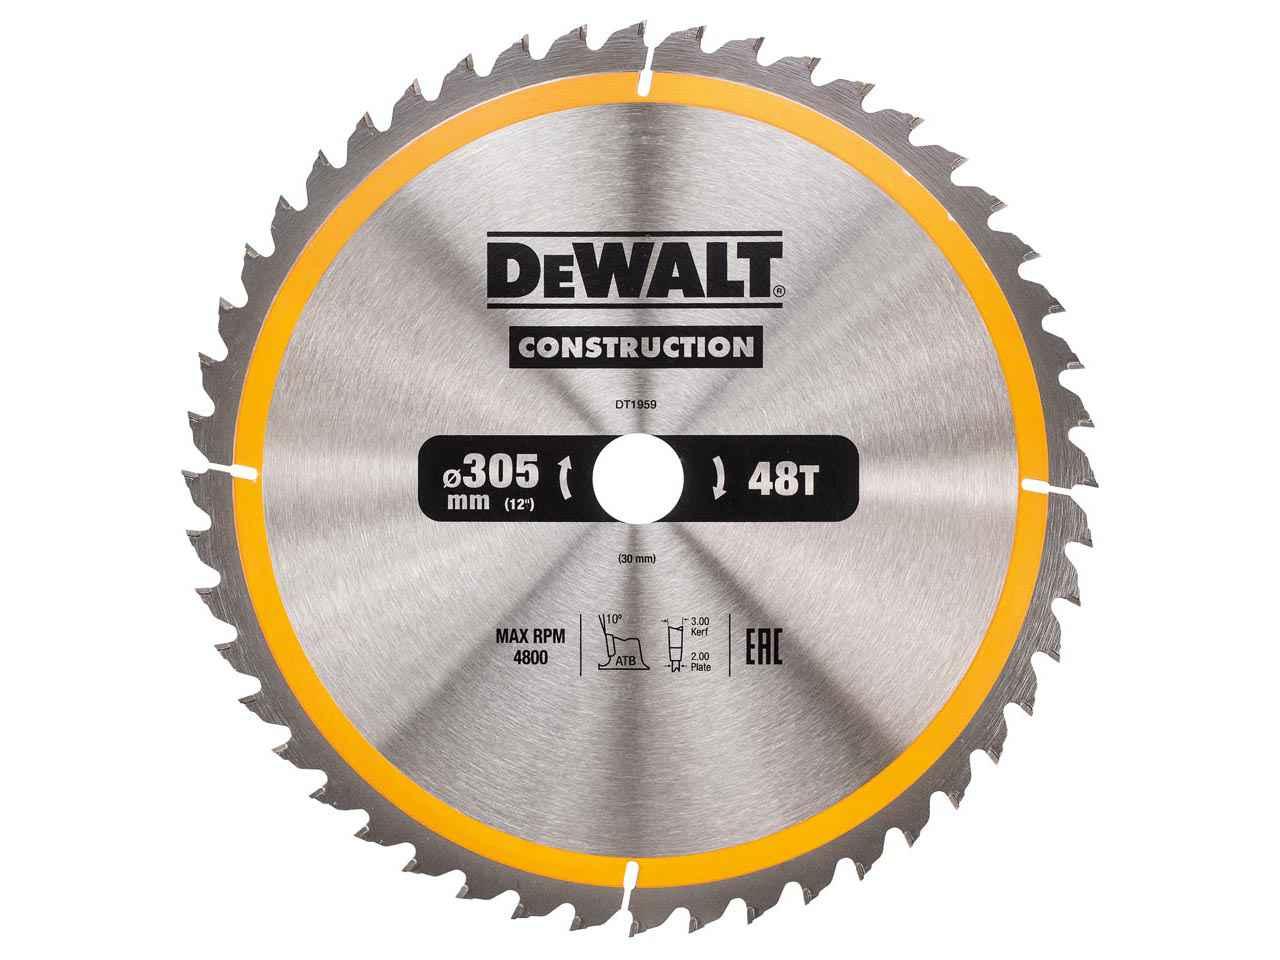 DeWalt DT1959QZ Construction Circular Saw Blade 305x30mm 48T